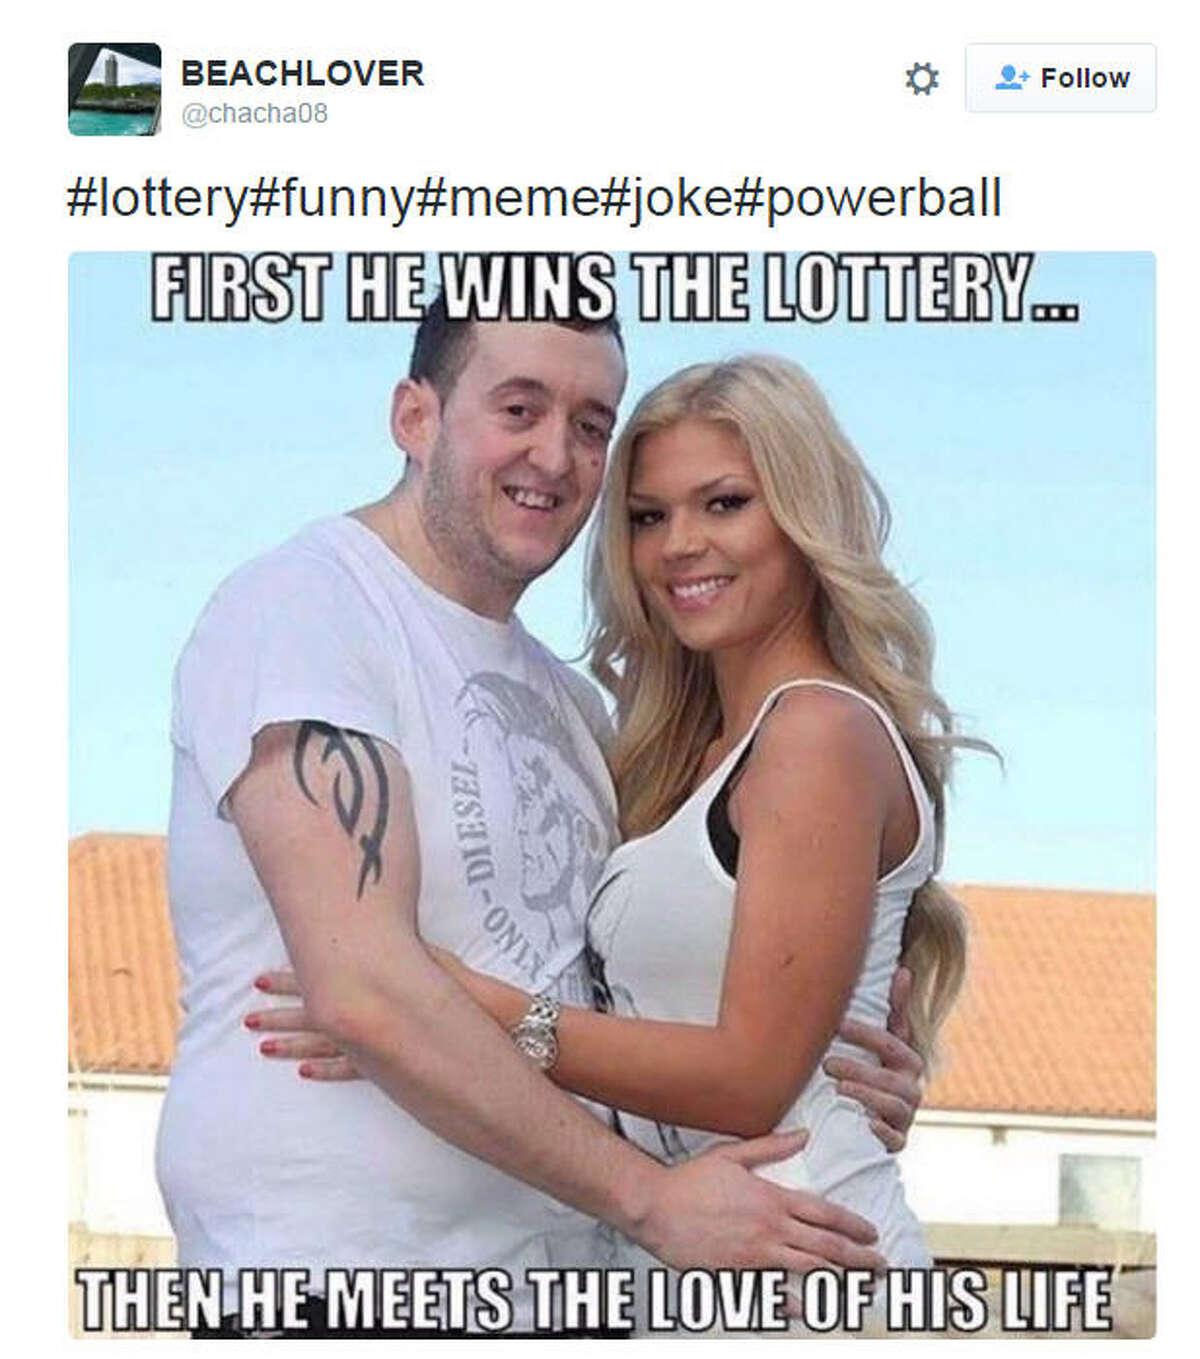 Powerball meme via @chacha08 on Twitter